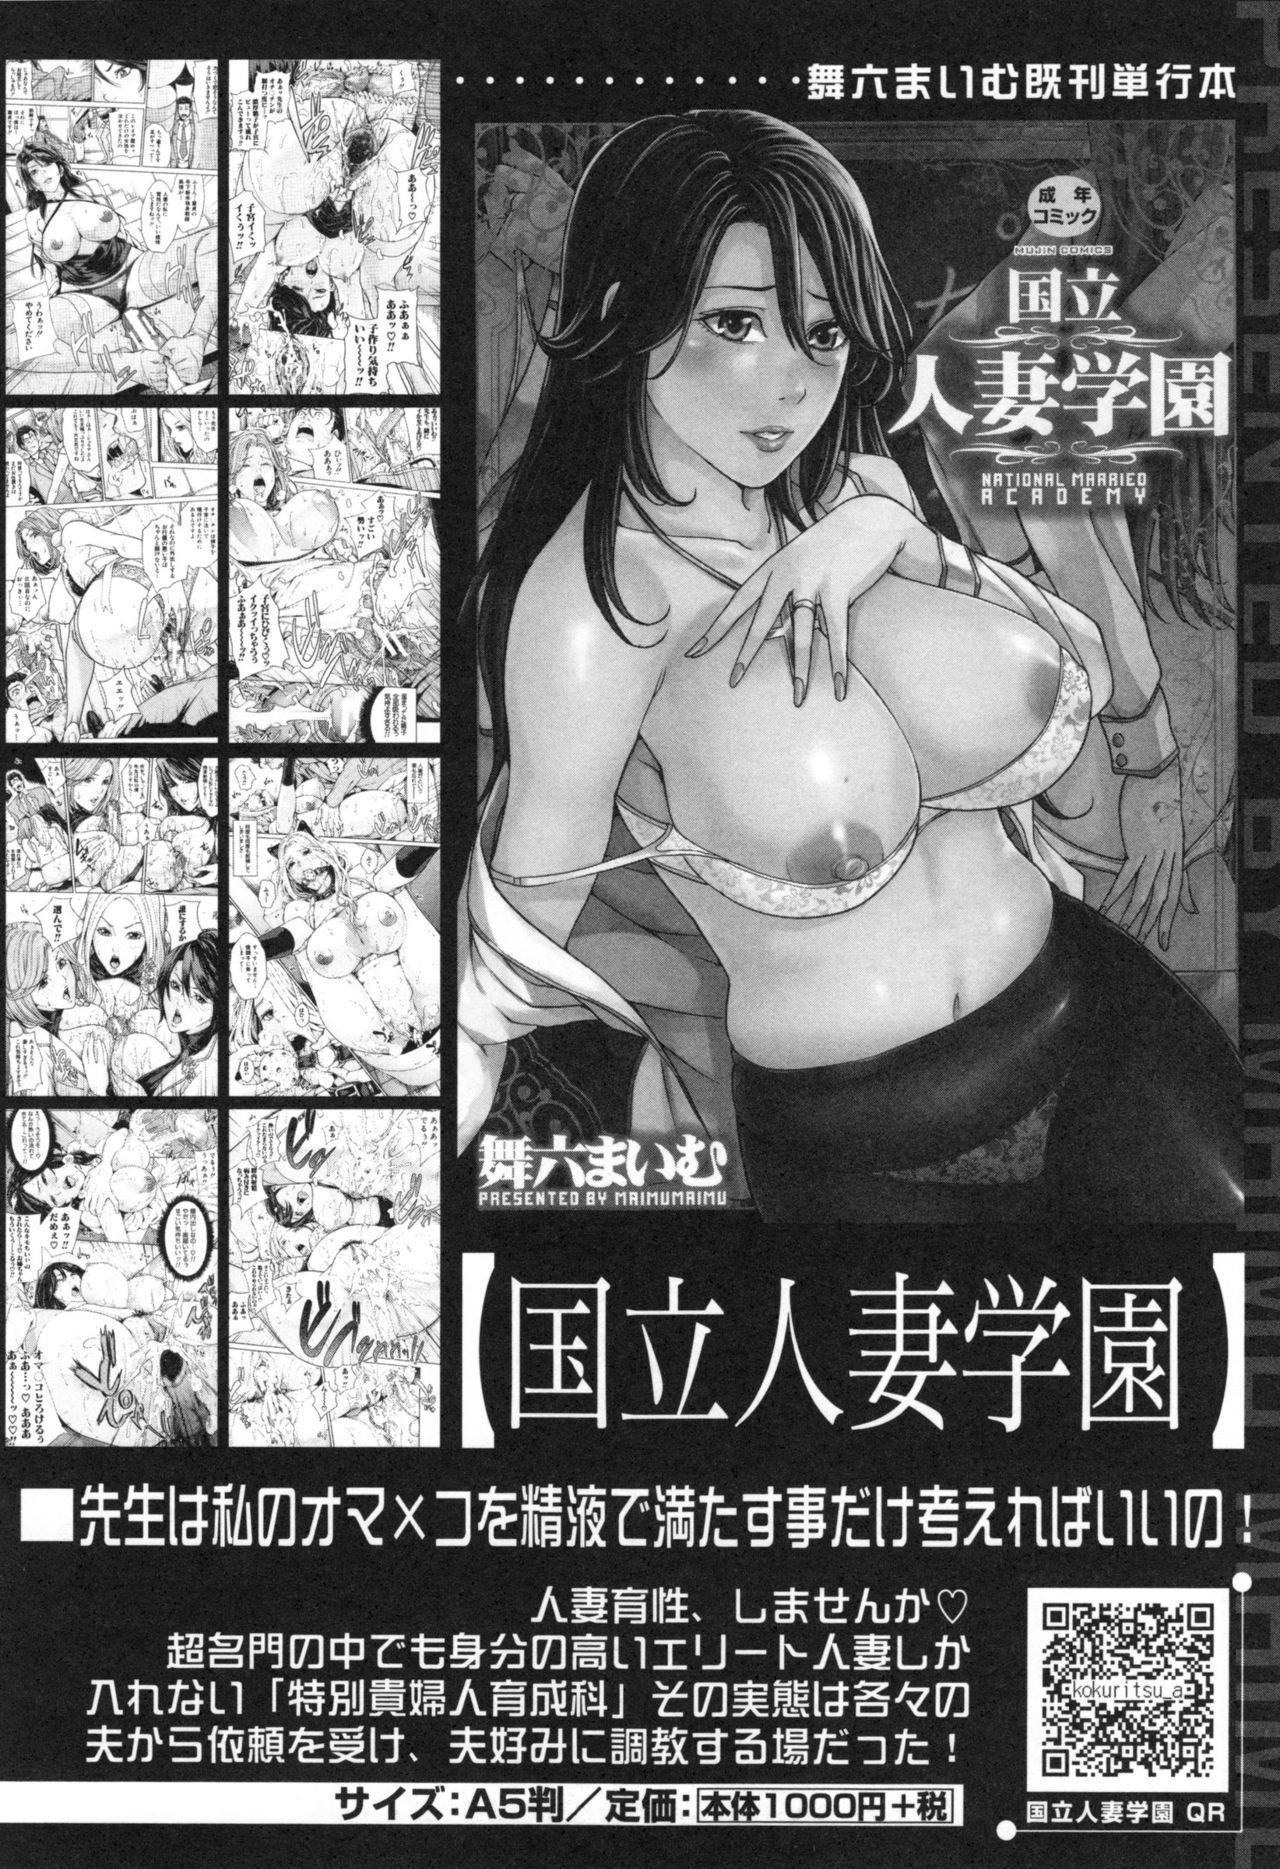 [Maimu-Maimu] Aniyome Bitch Life | Sister-in-Law Slut Life [English] {Taihen Zombii} 188